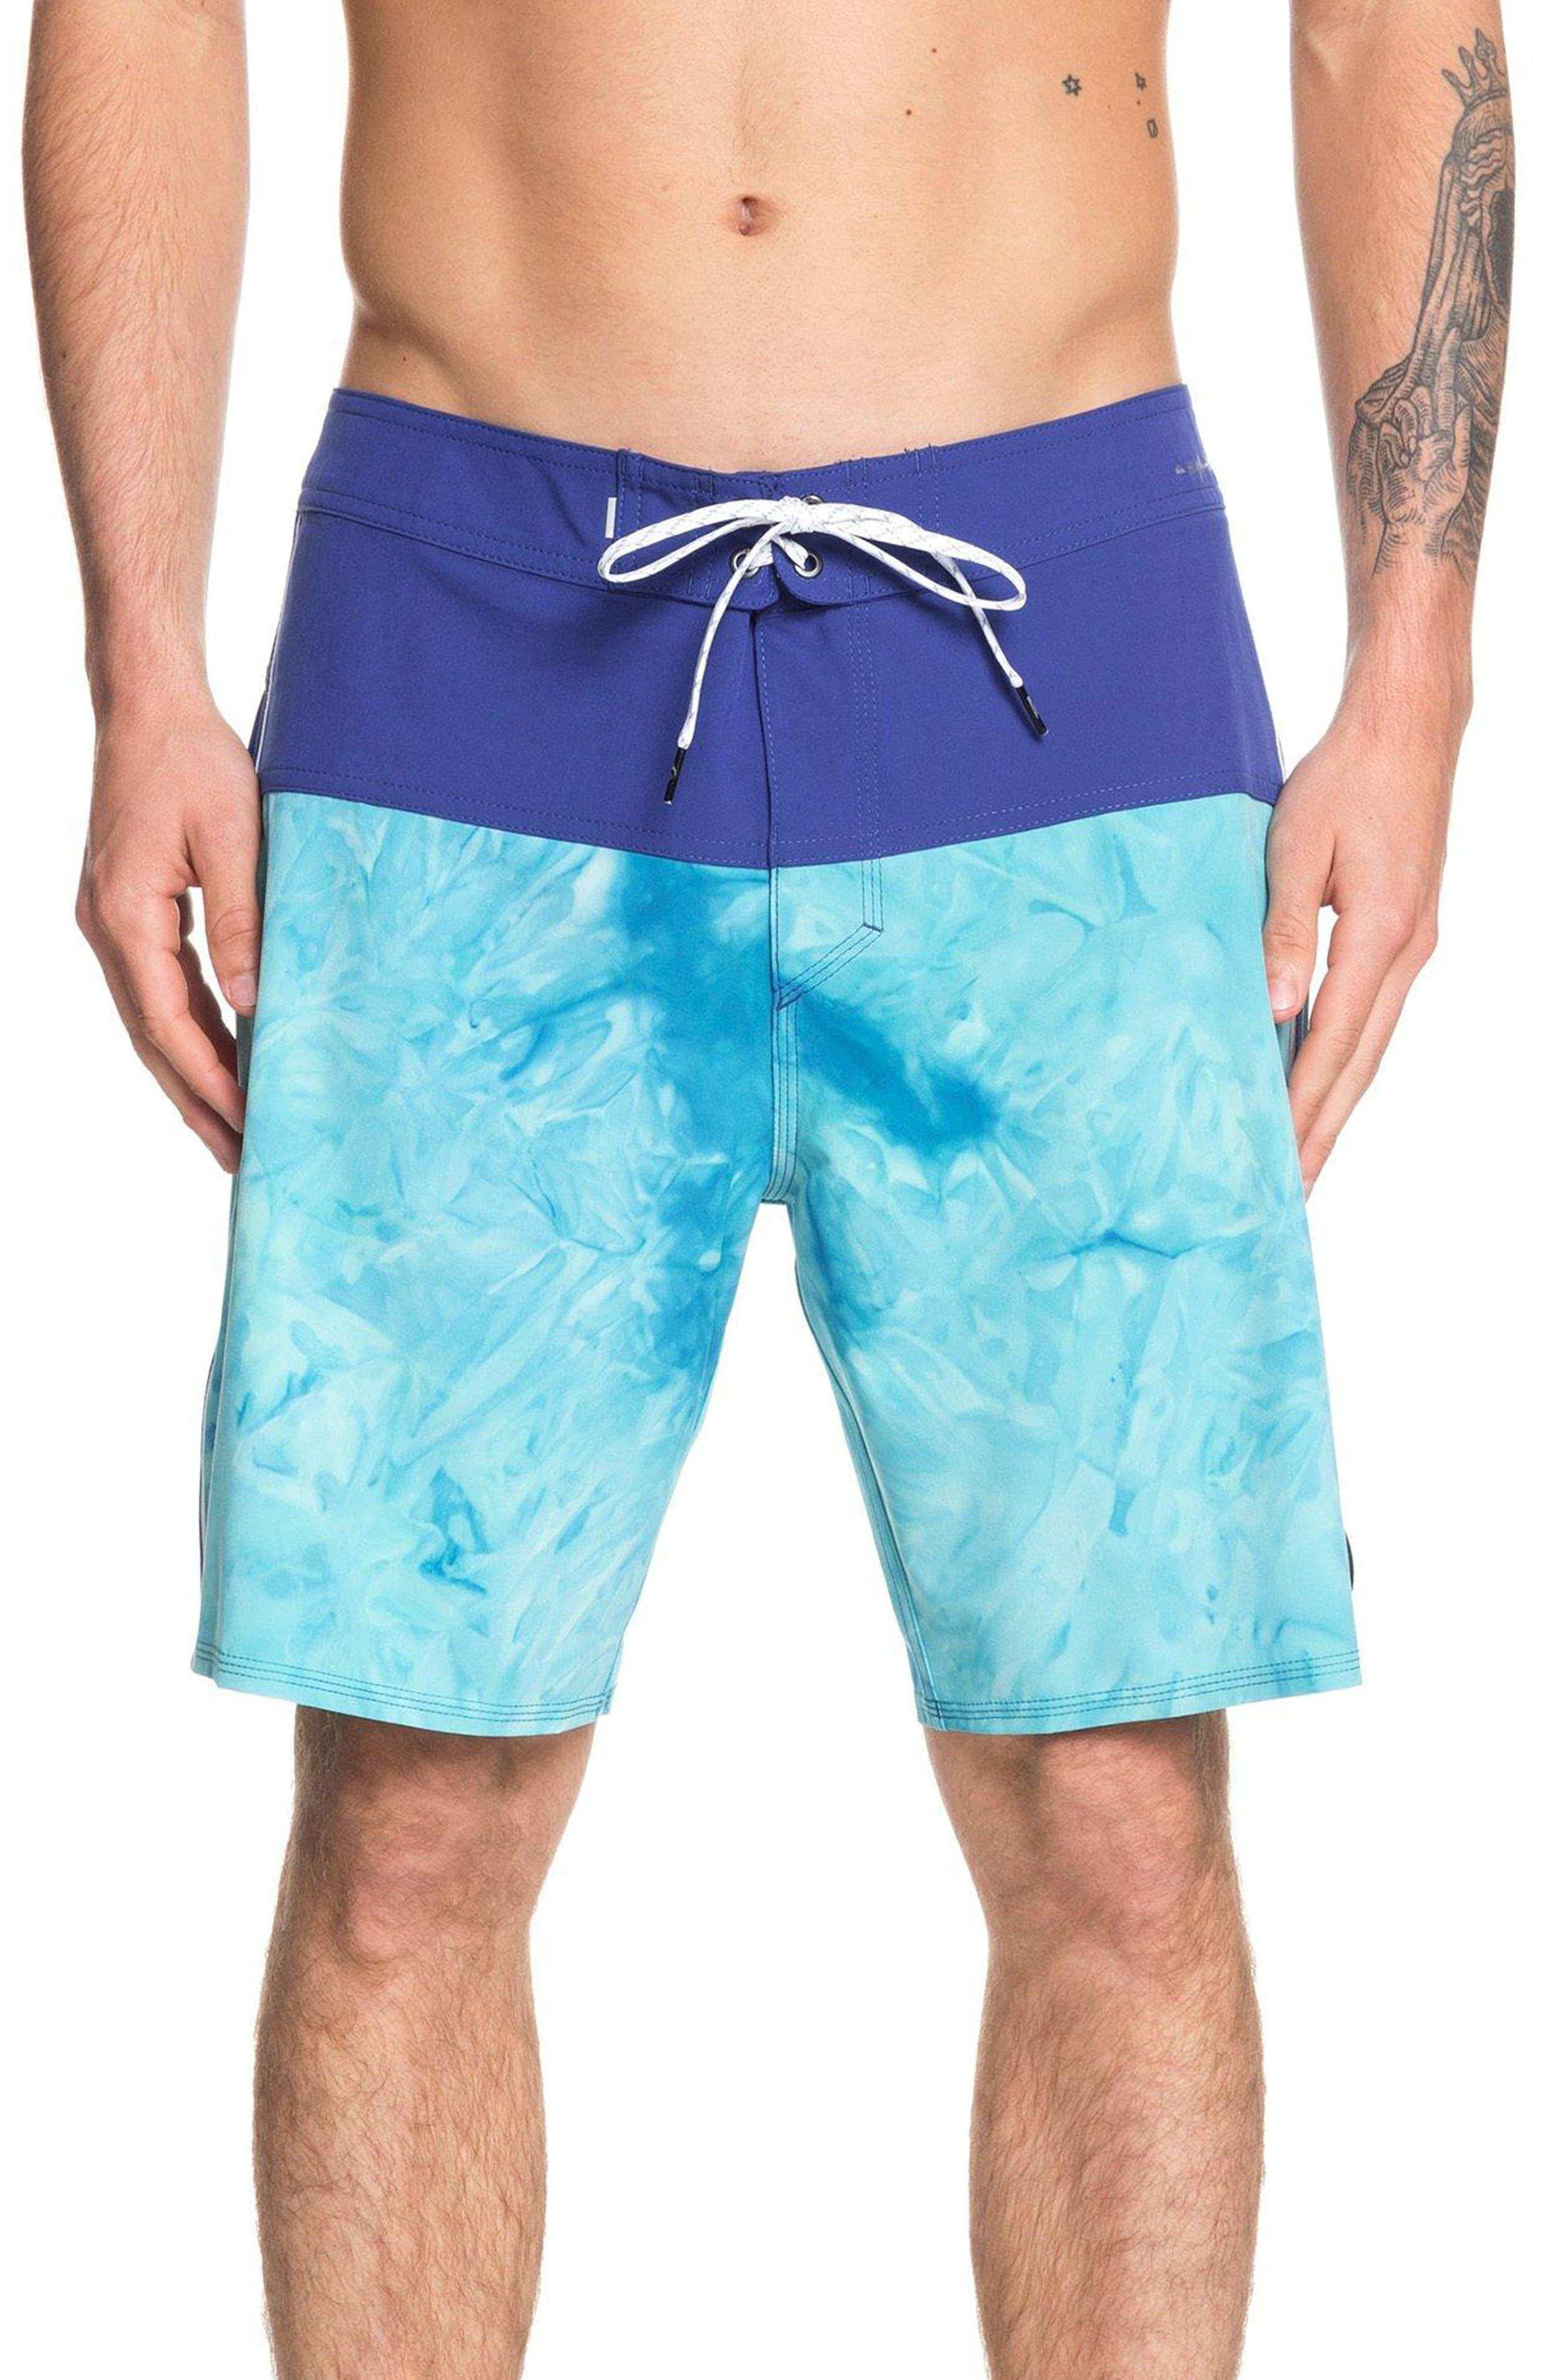 Quiksilver Mens Highline Dead Floral 18 Boardshort Swim Trunk